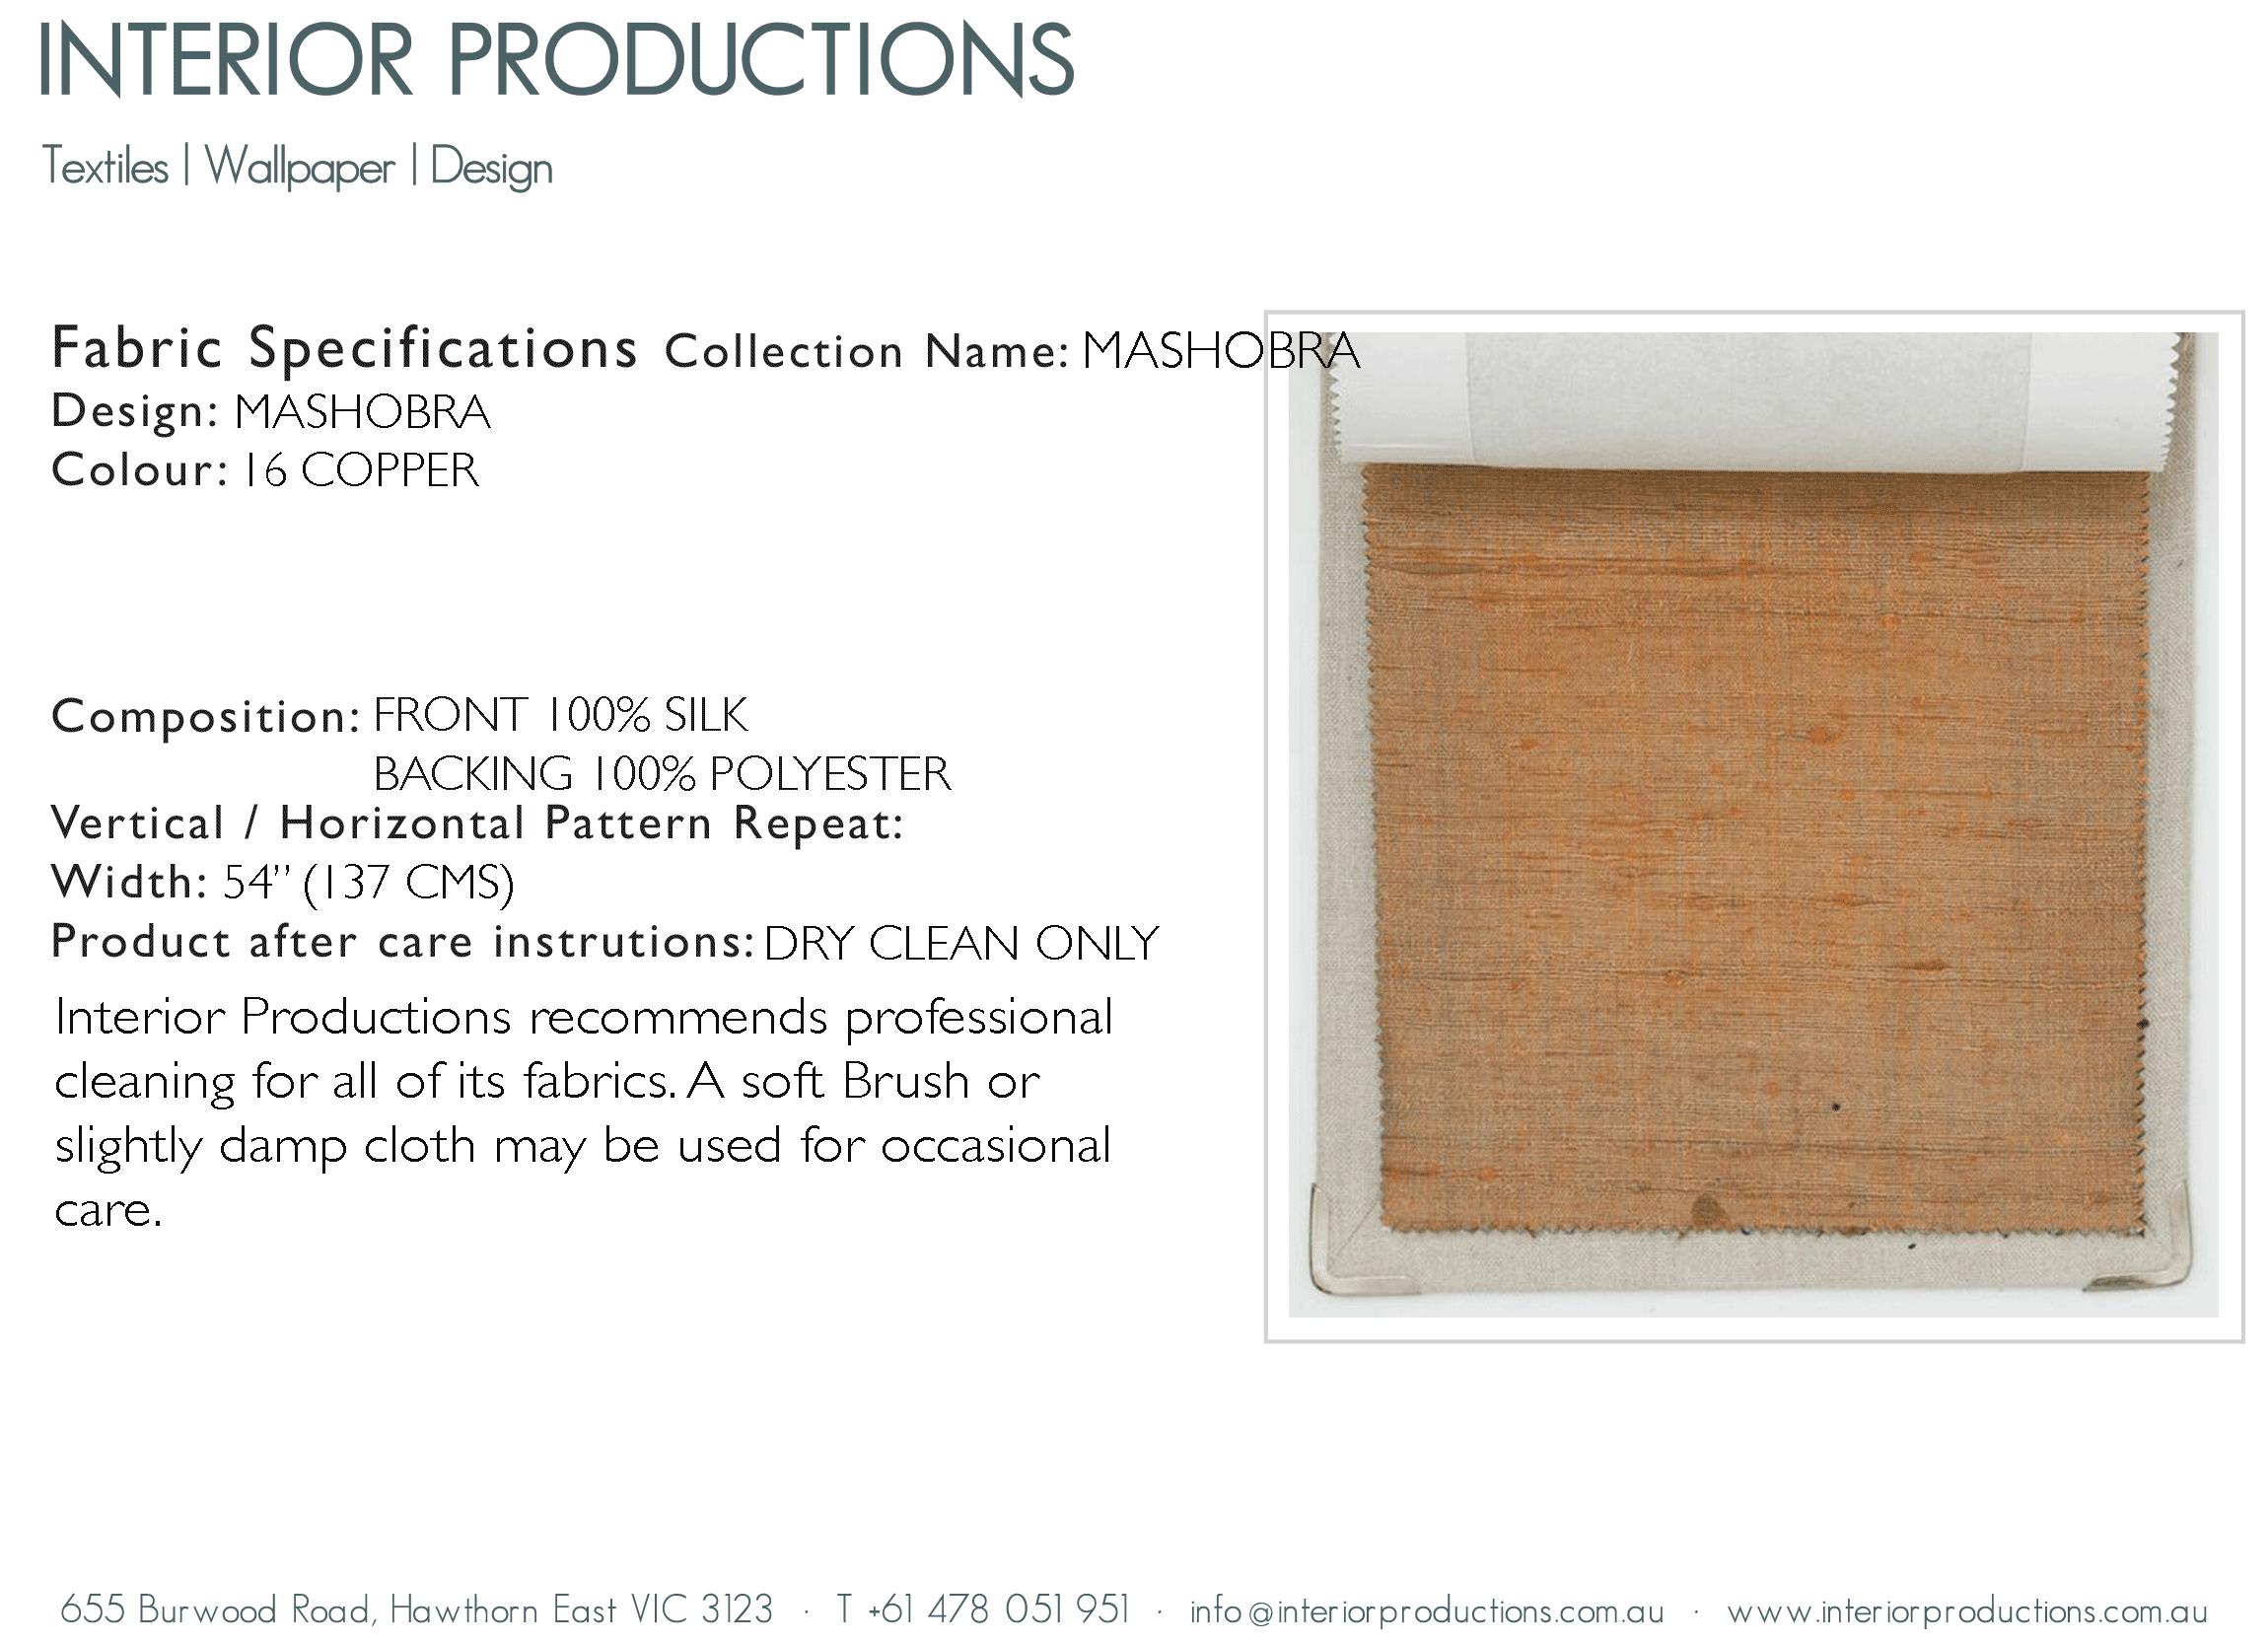 interior_productions_MASHOBRA---16-COPPER